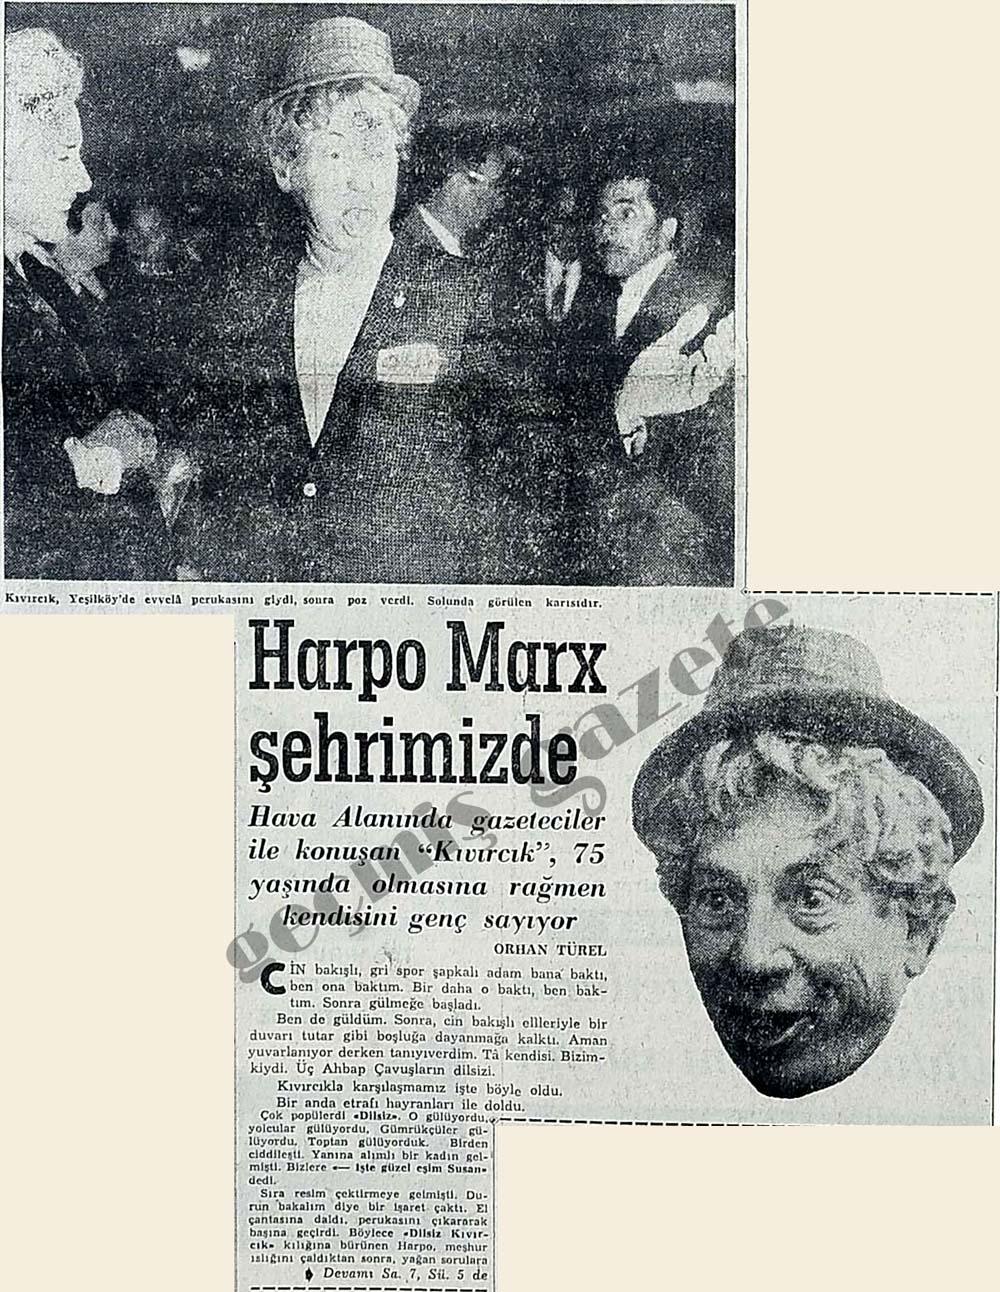 Harpo Marx şehrimizde